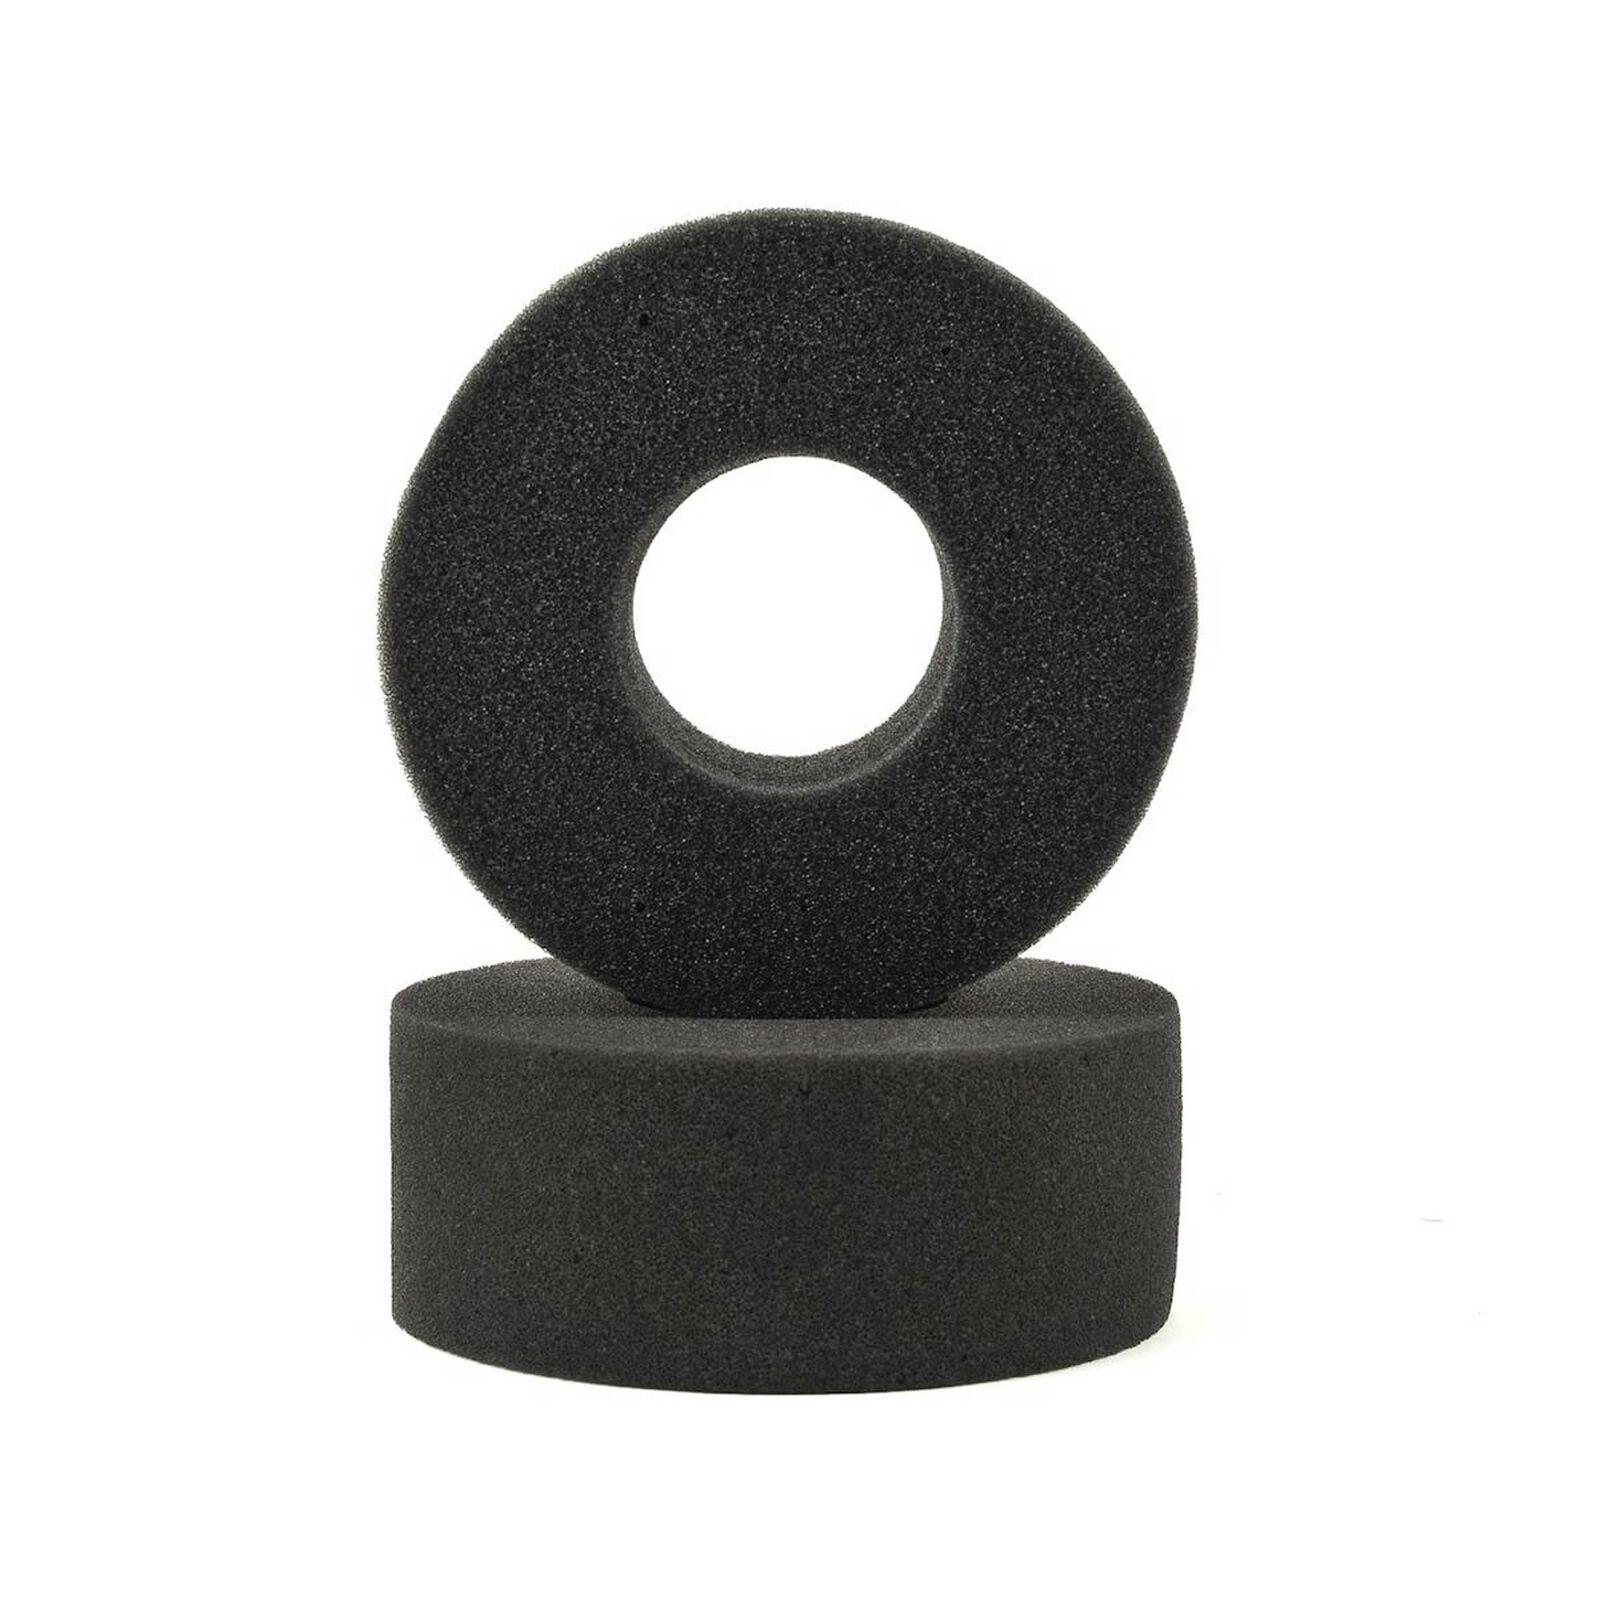 Dirty Richard Single Stage Foam Inserts Medium 98x47.6x32 (2)